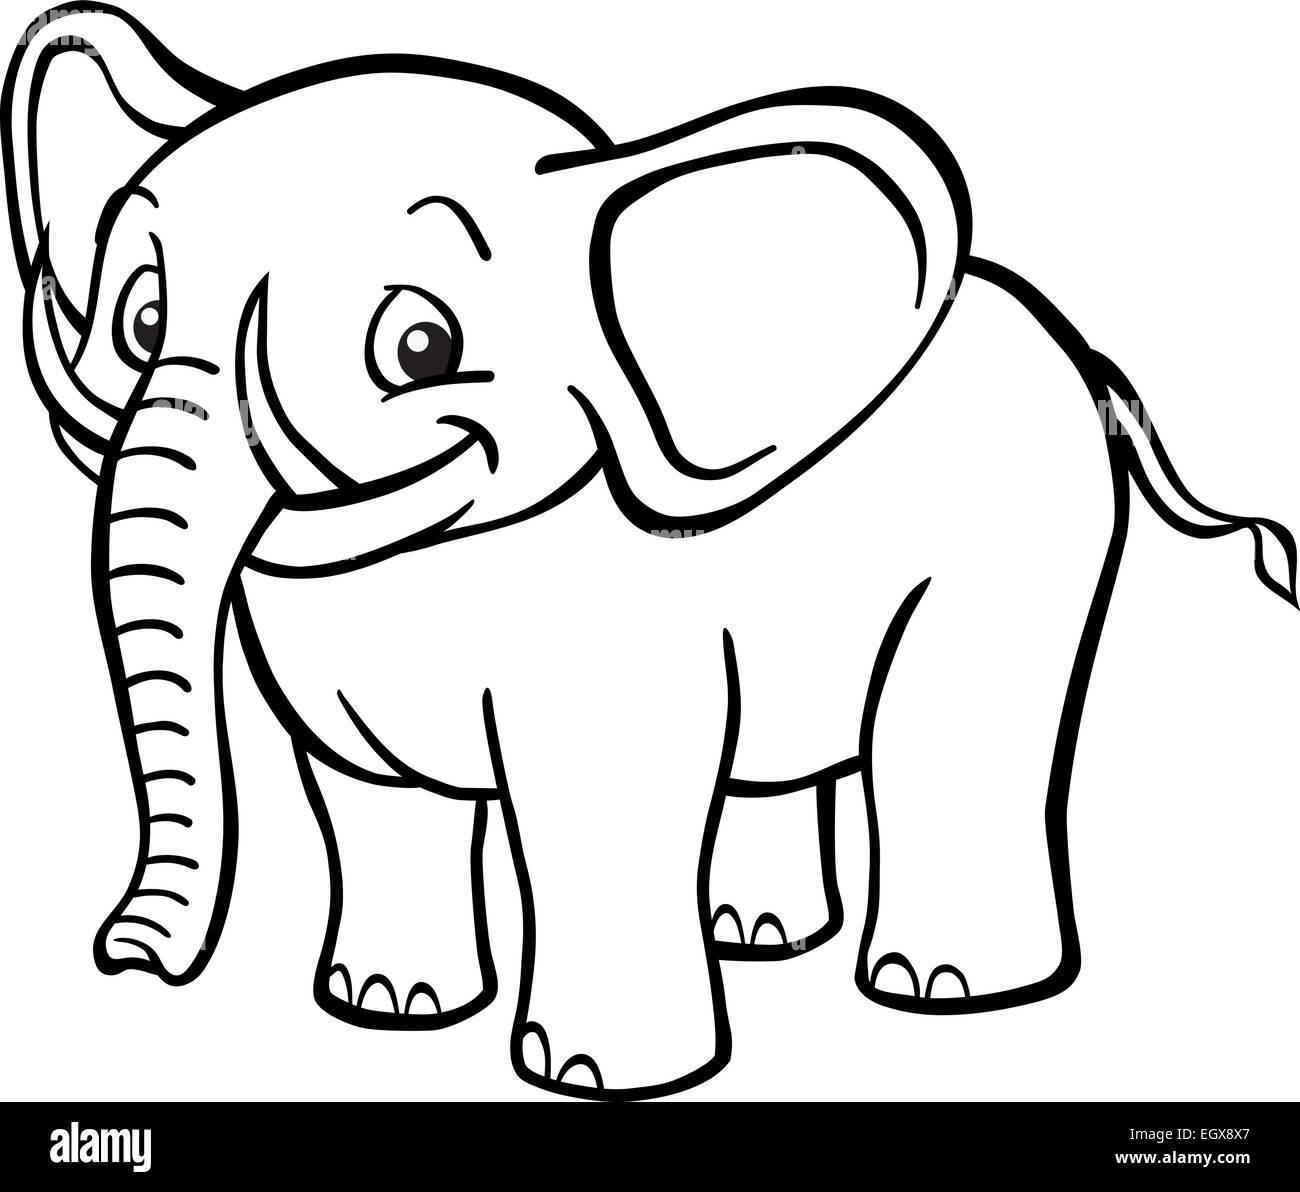 Black White Happy Cartoon Elephant Stockfotos Black White Happy